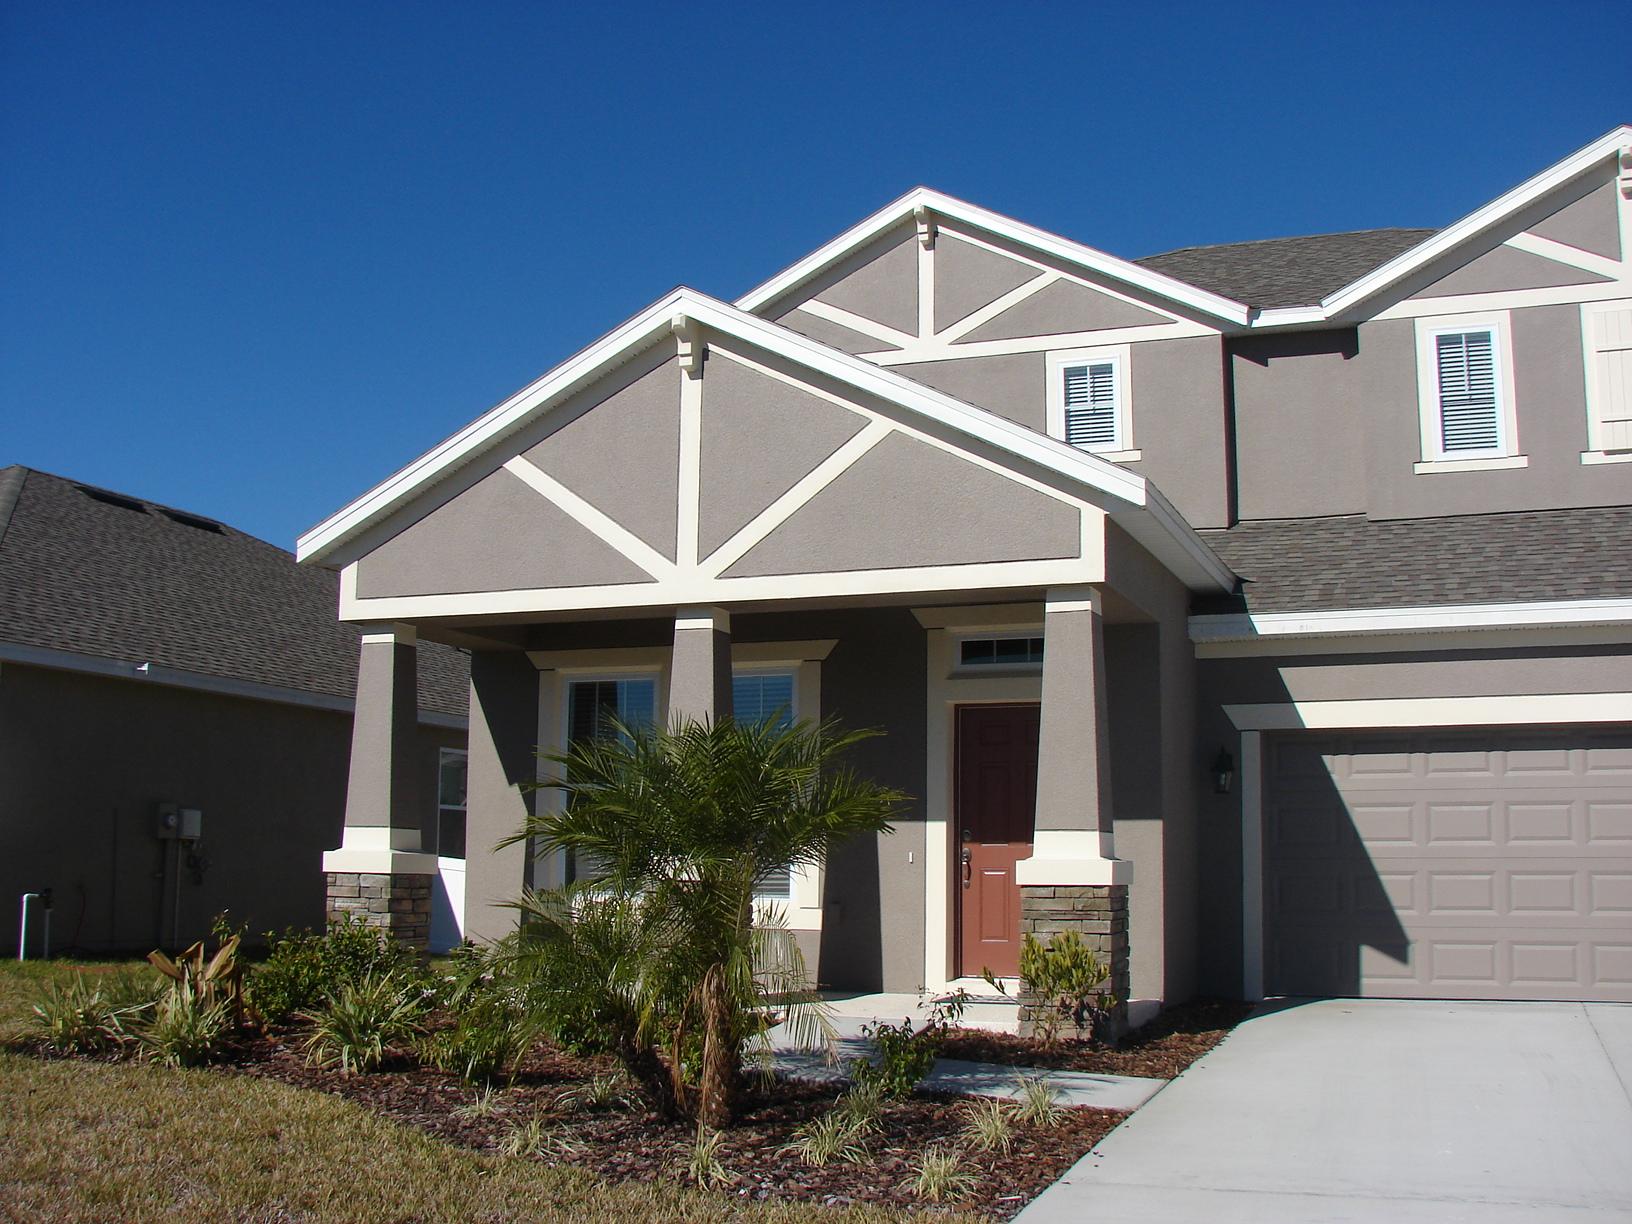 Dover Florida Real Estate | Dover Florida Realtor | New Homes Communities